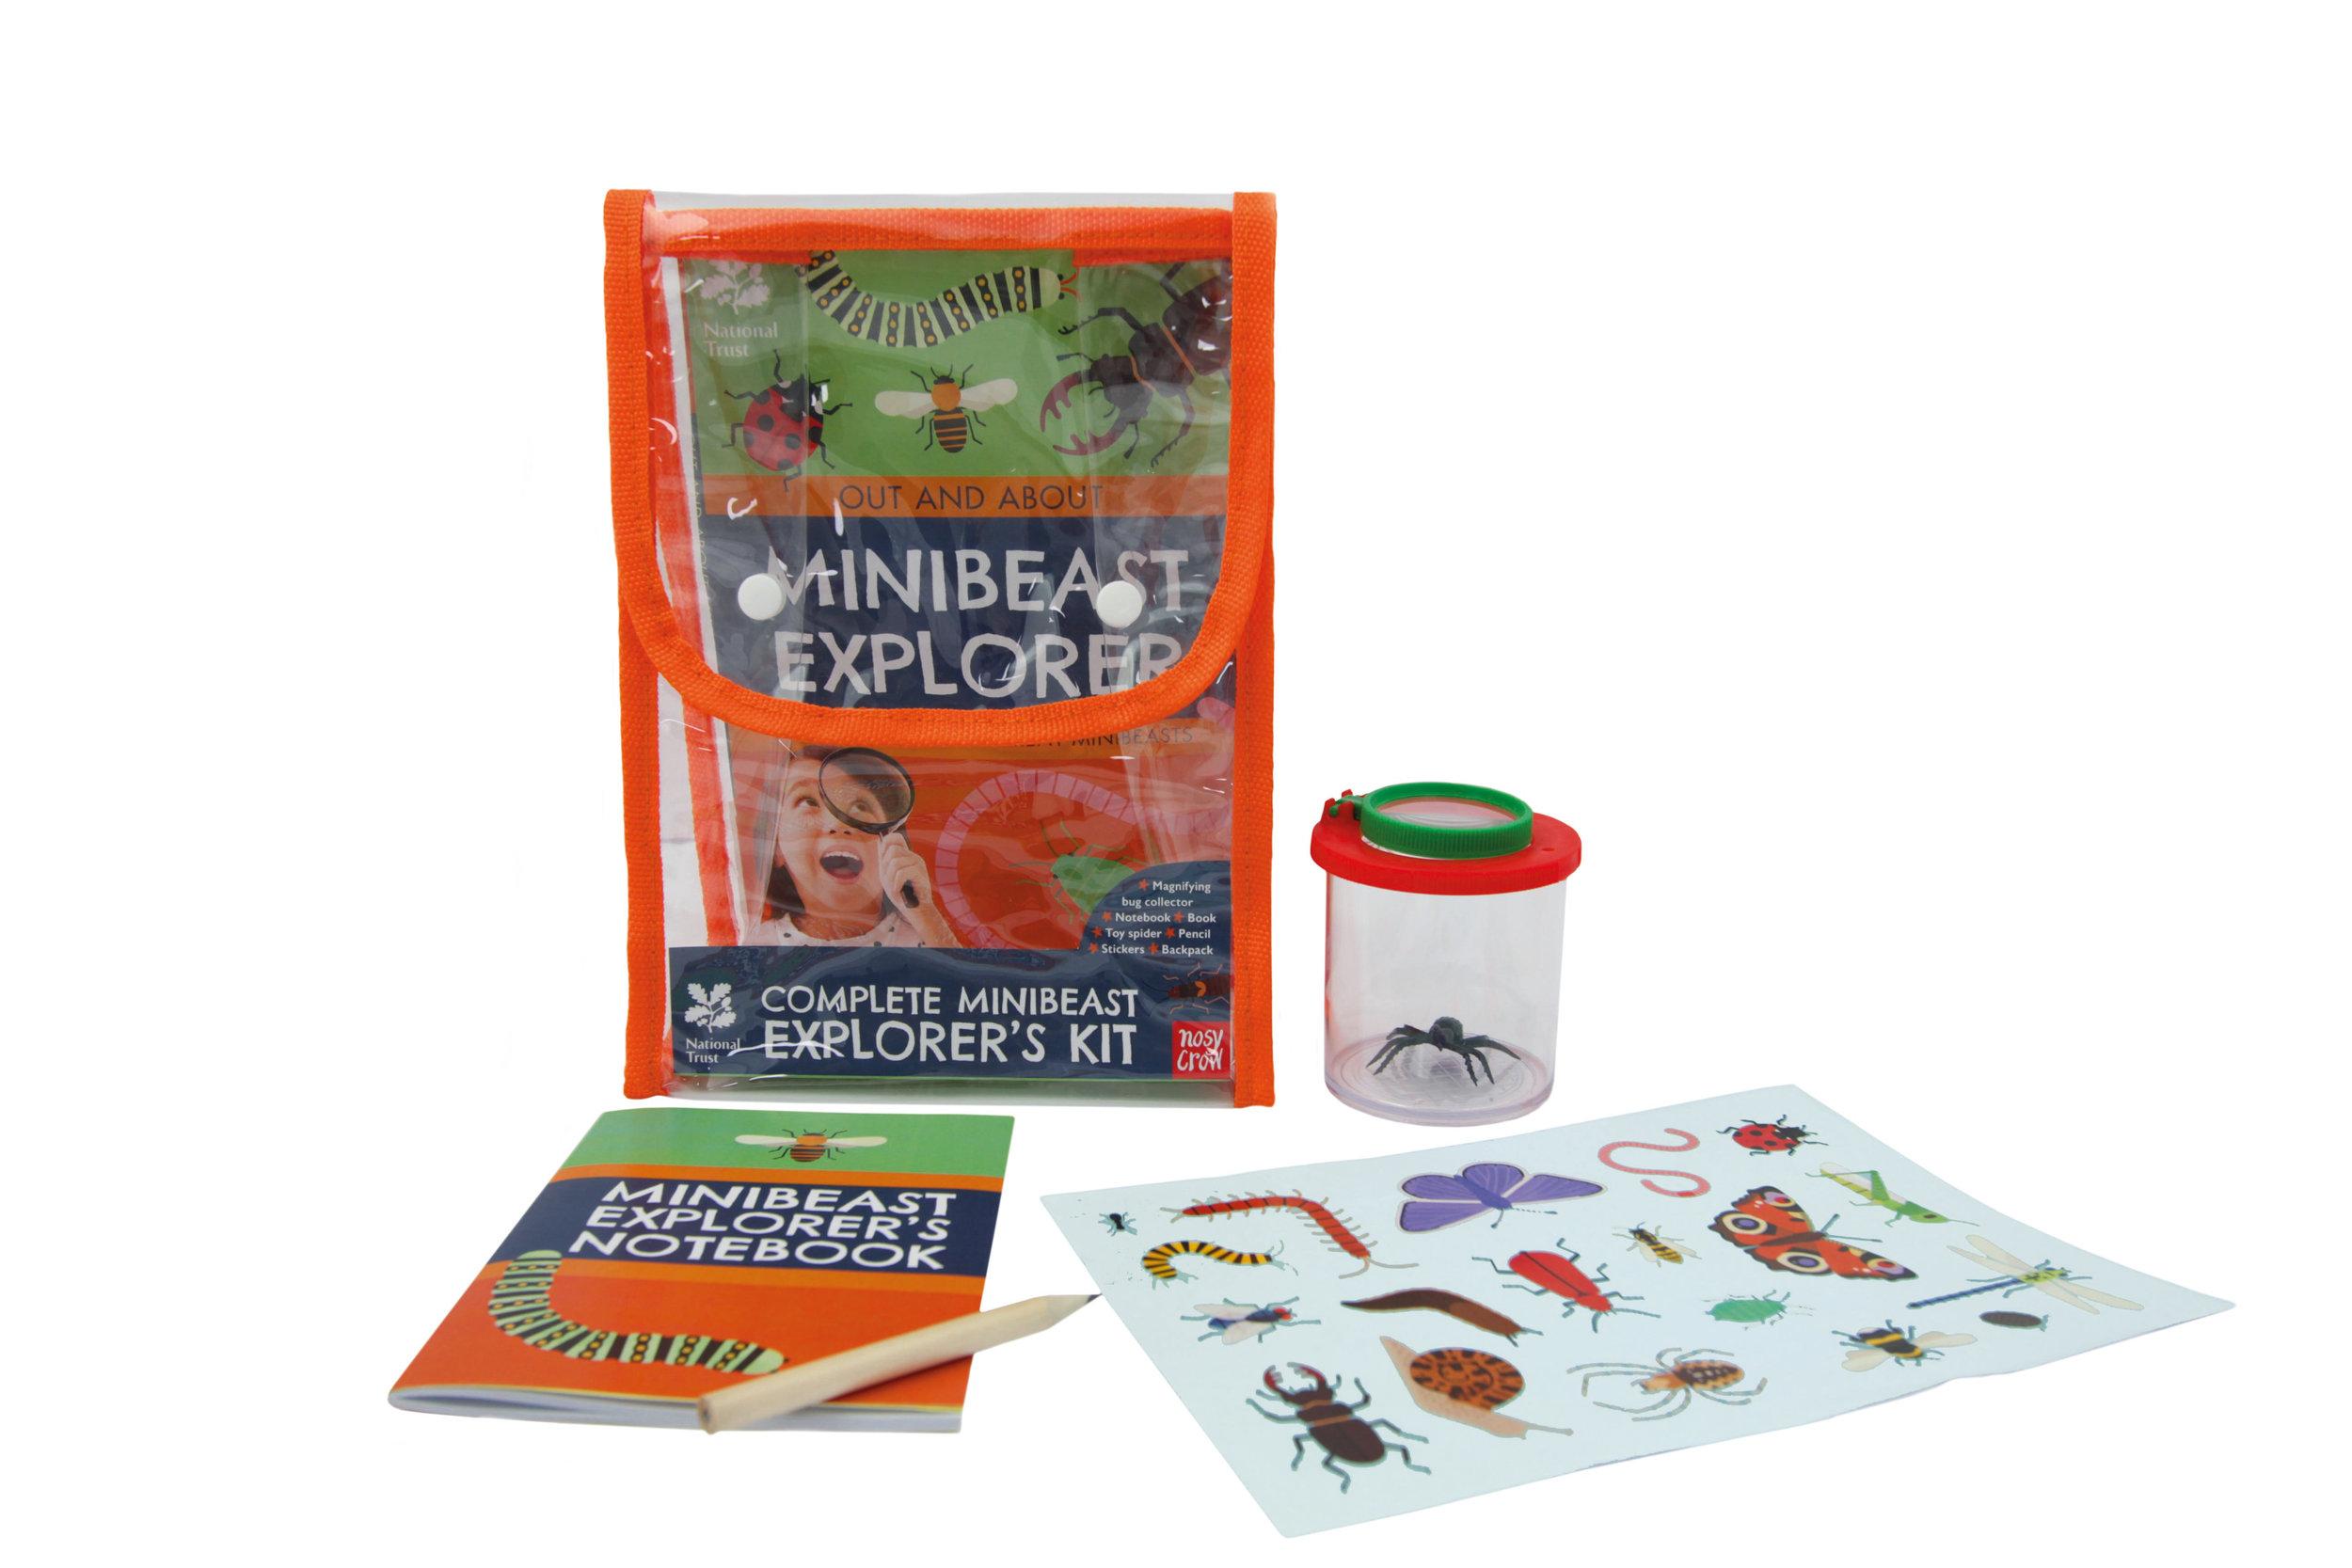 MiniBeastExplPack_packshot_WEB.jpg